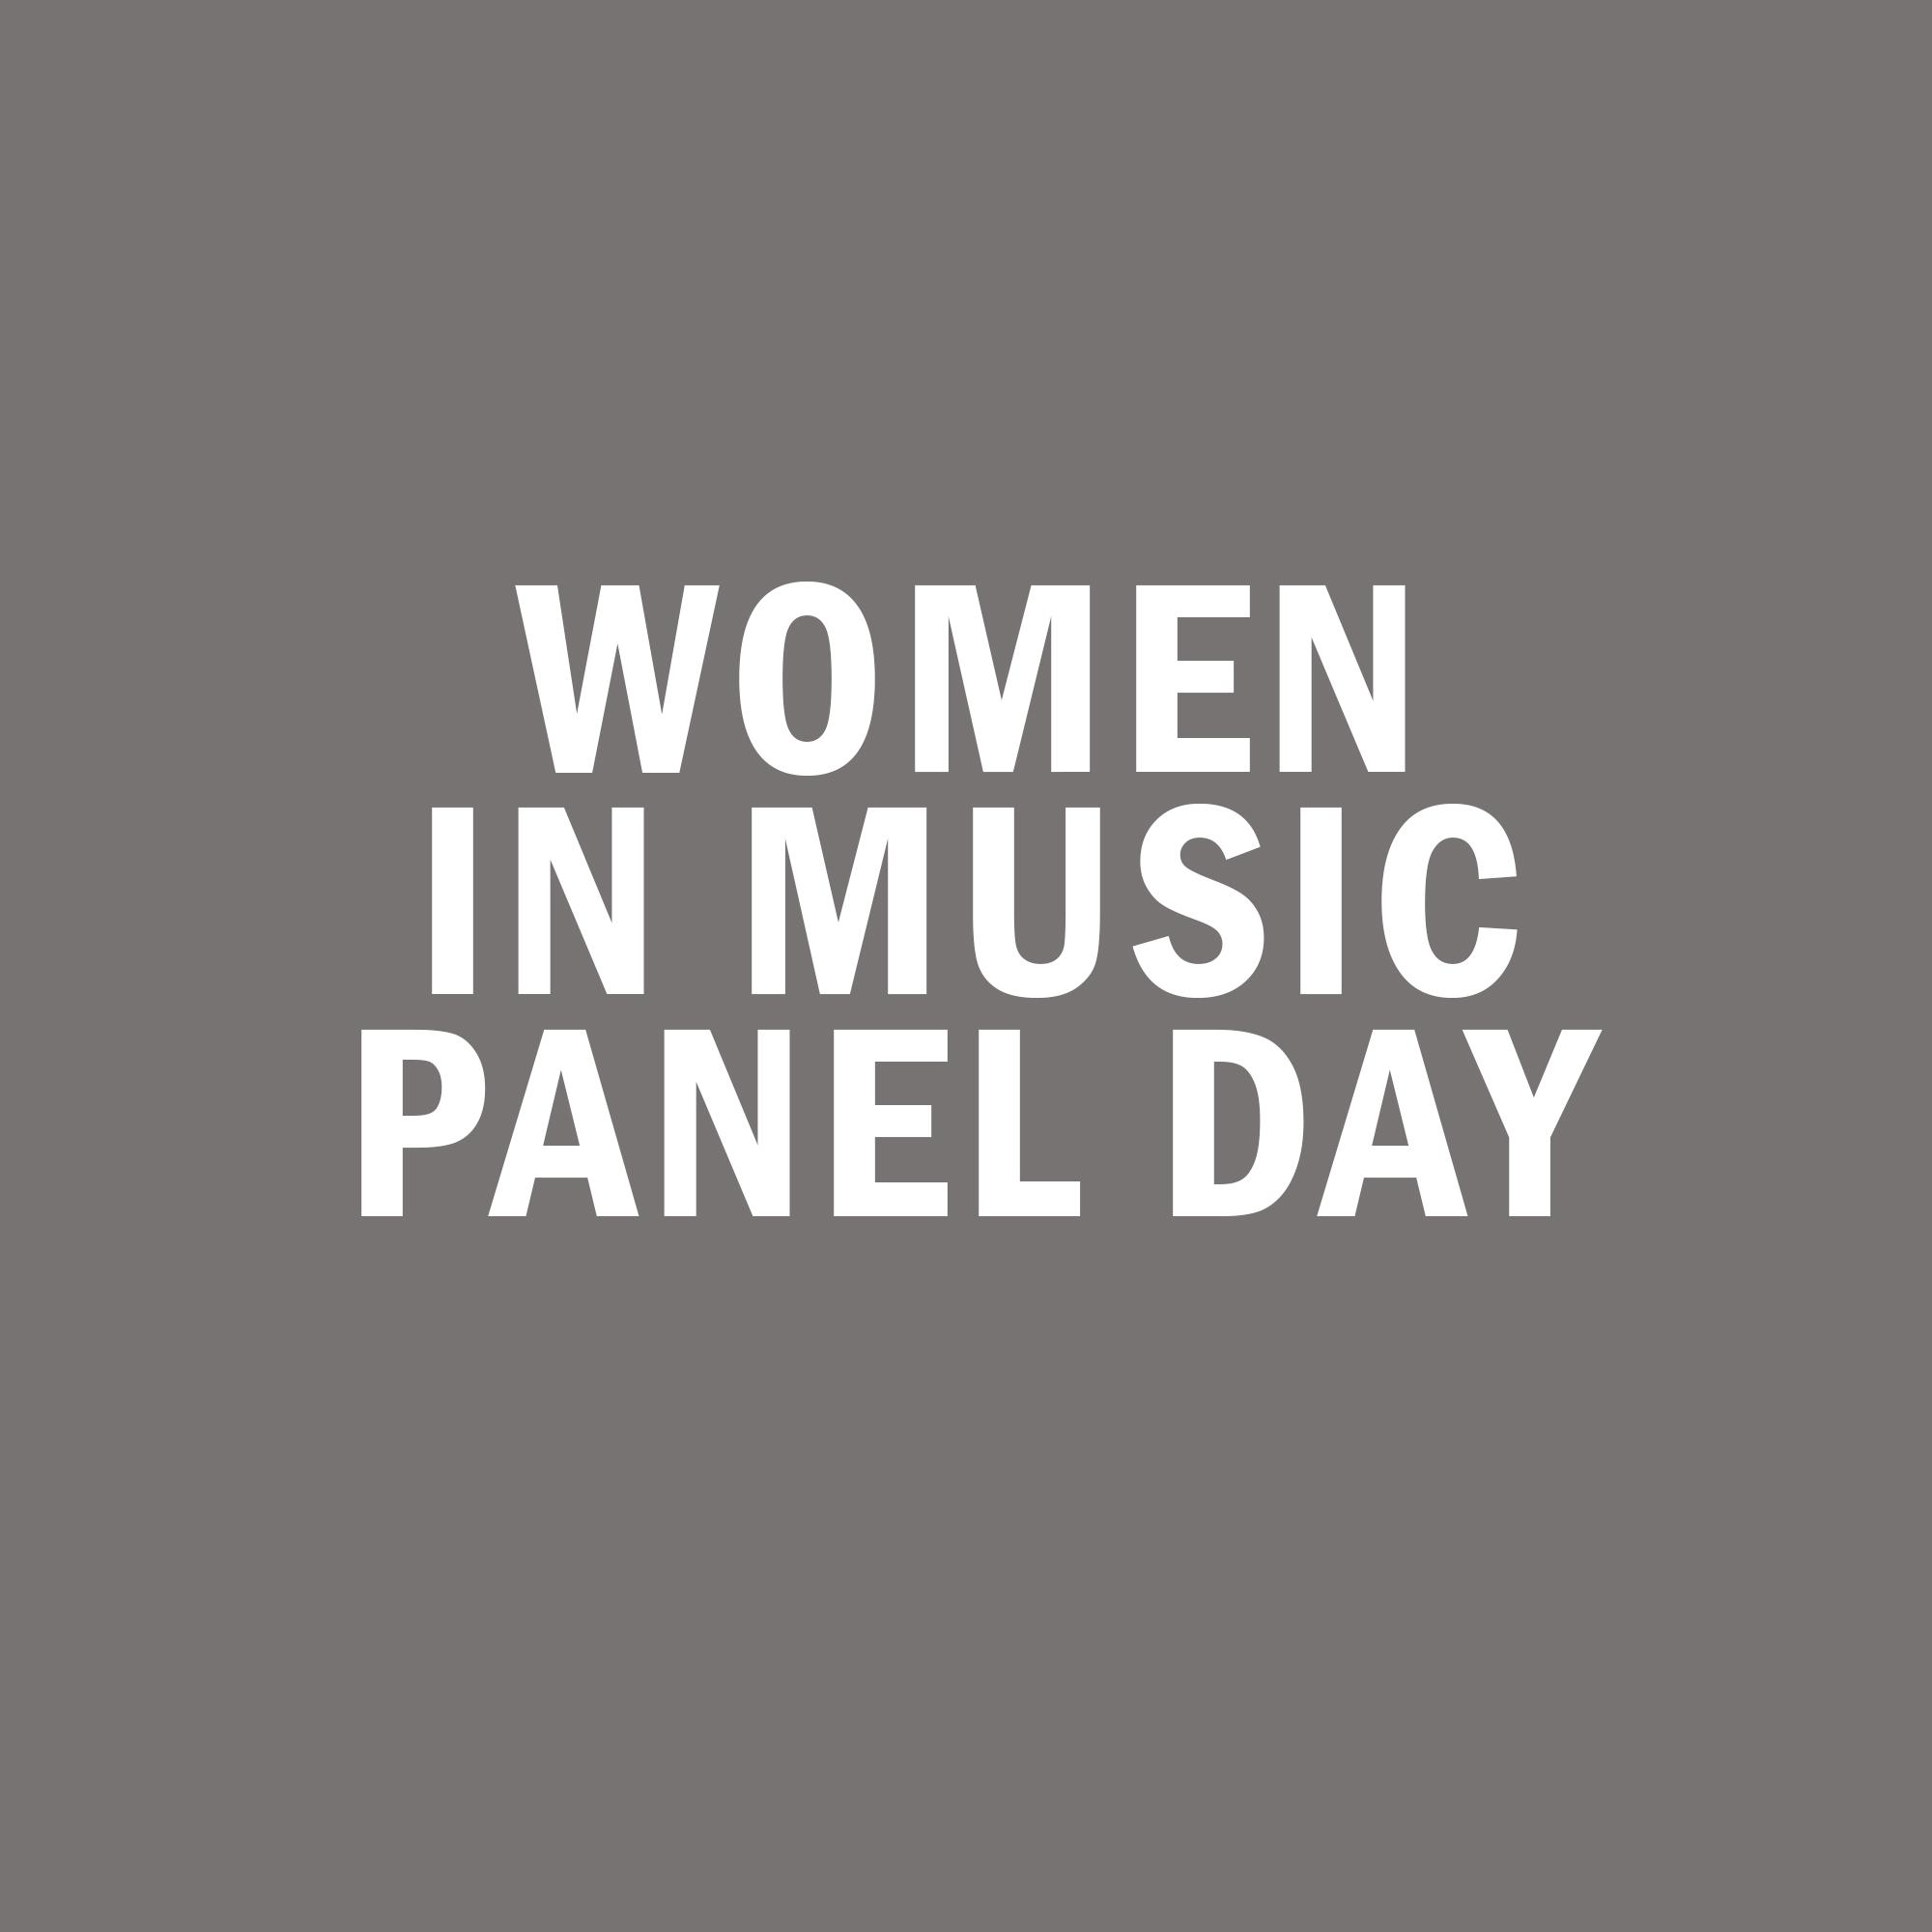 panel-day-tickets-women-in-music.jpg